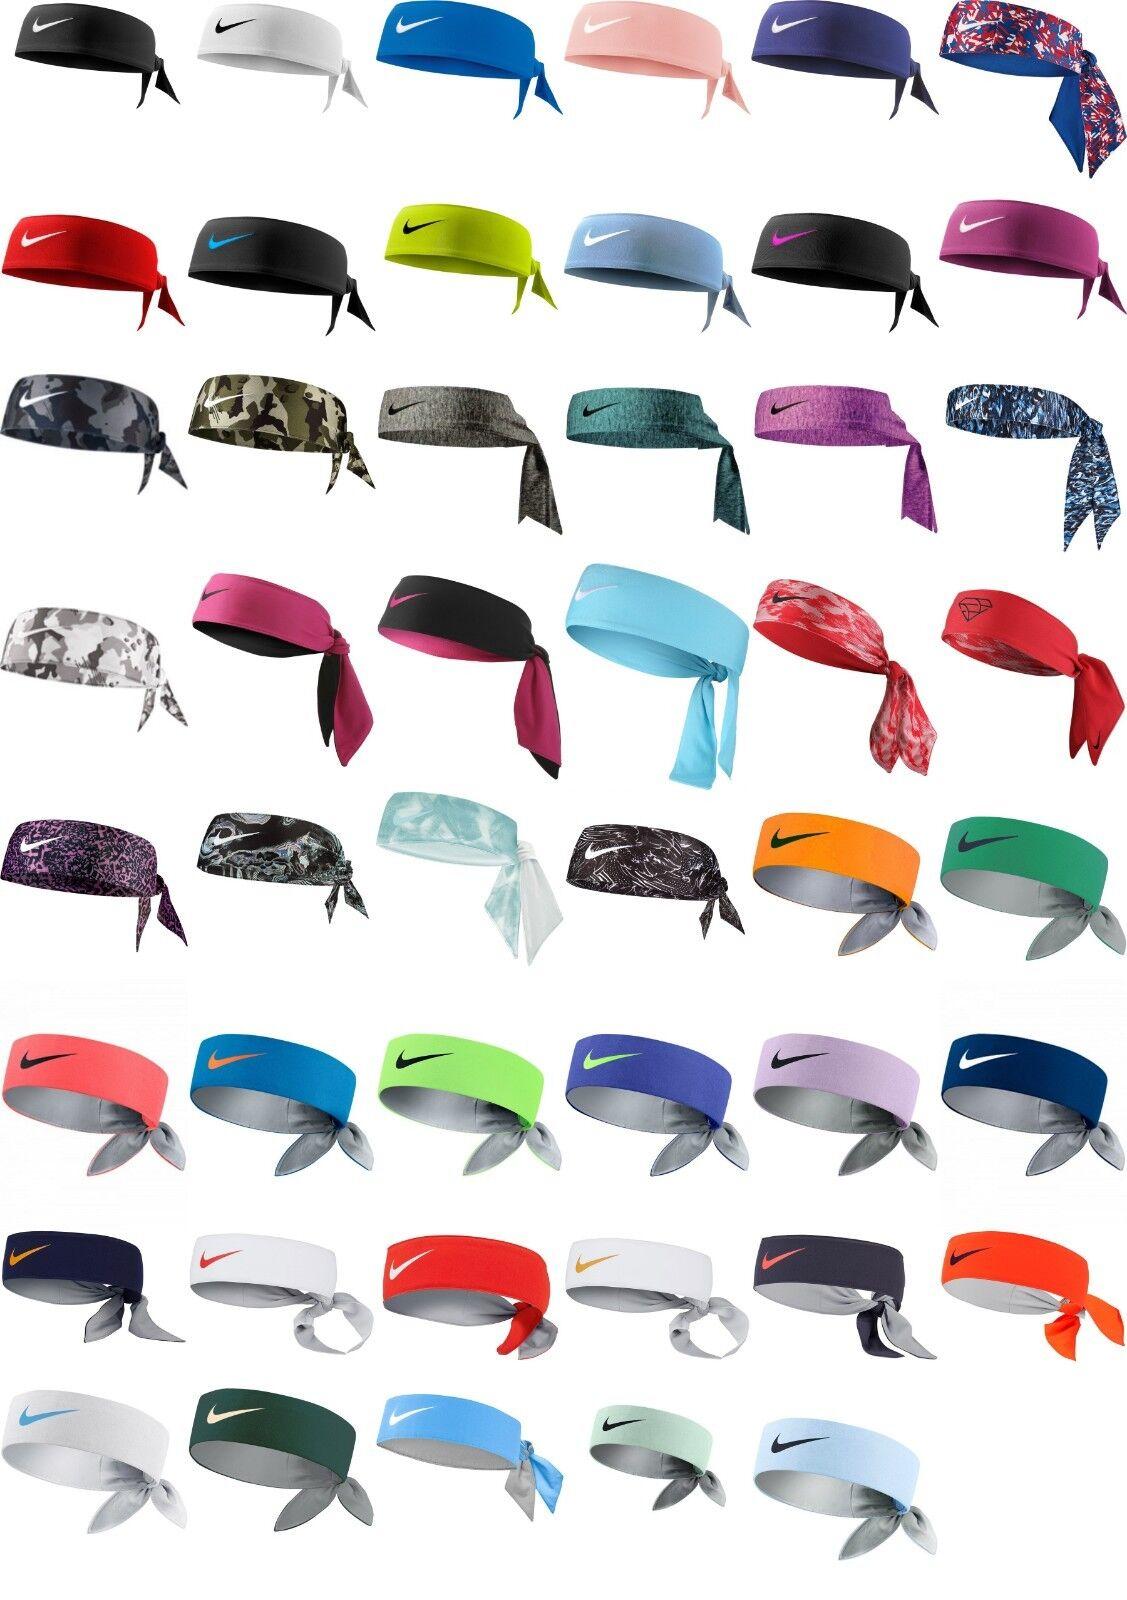 Nike Dry Bandana Head Tie Headband Midnight Turquoise//Silver Men/'s Women/'s